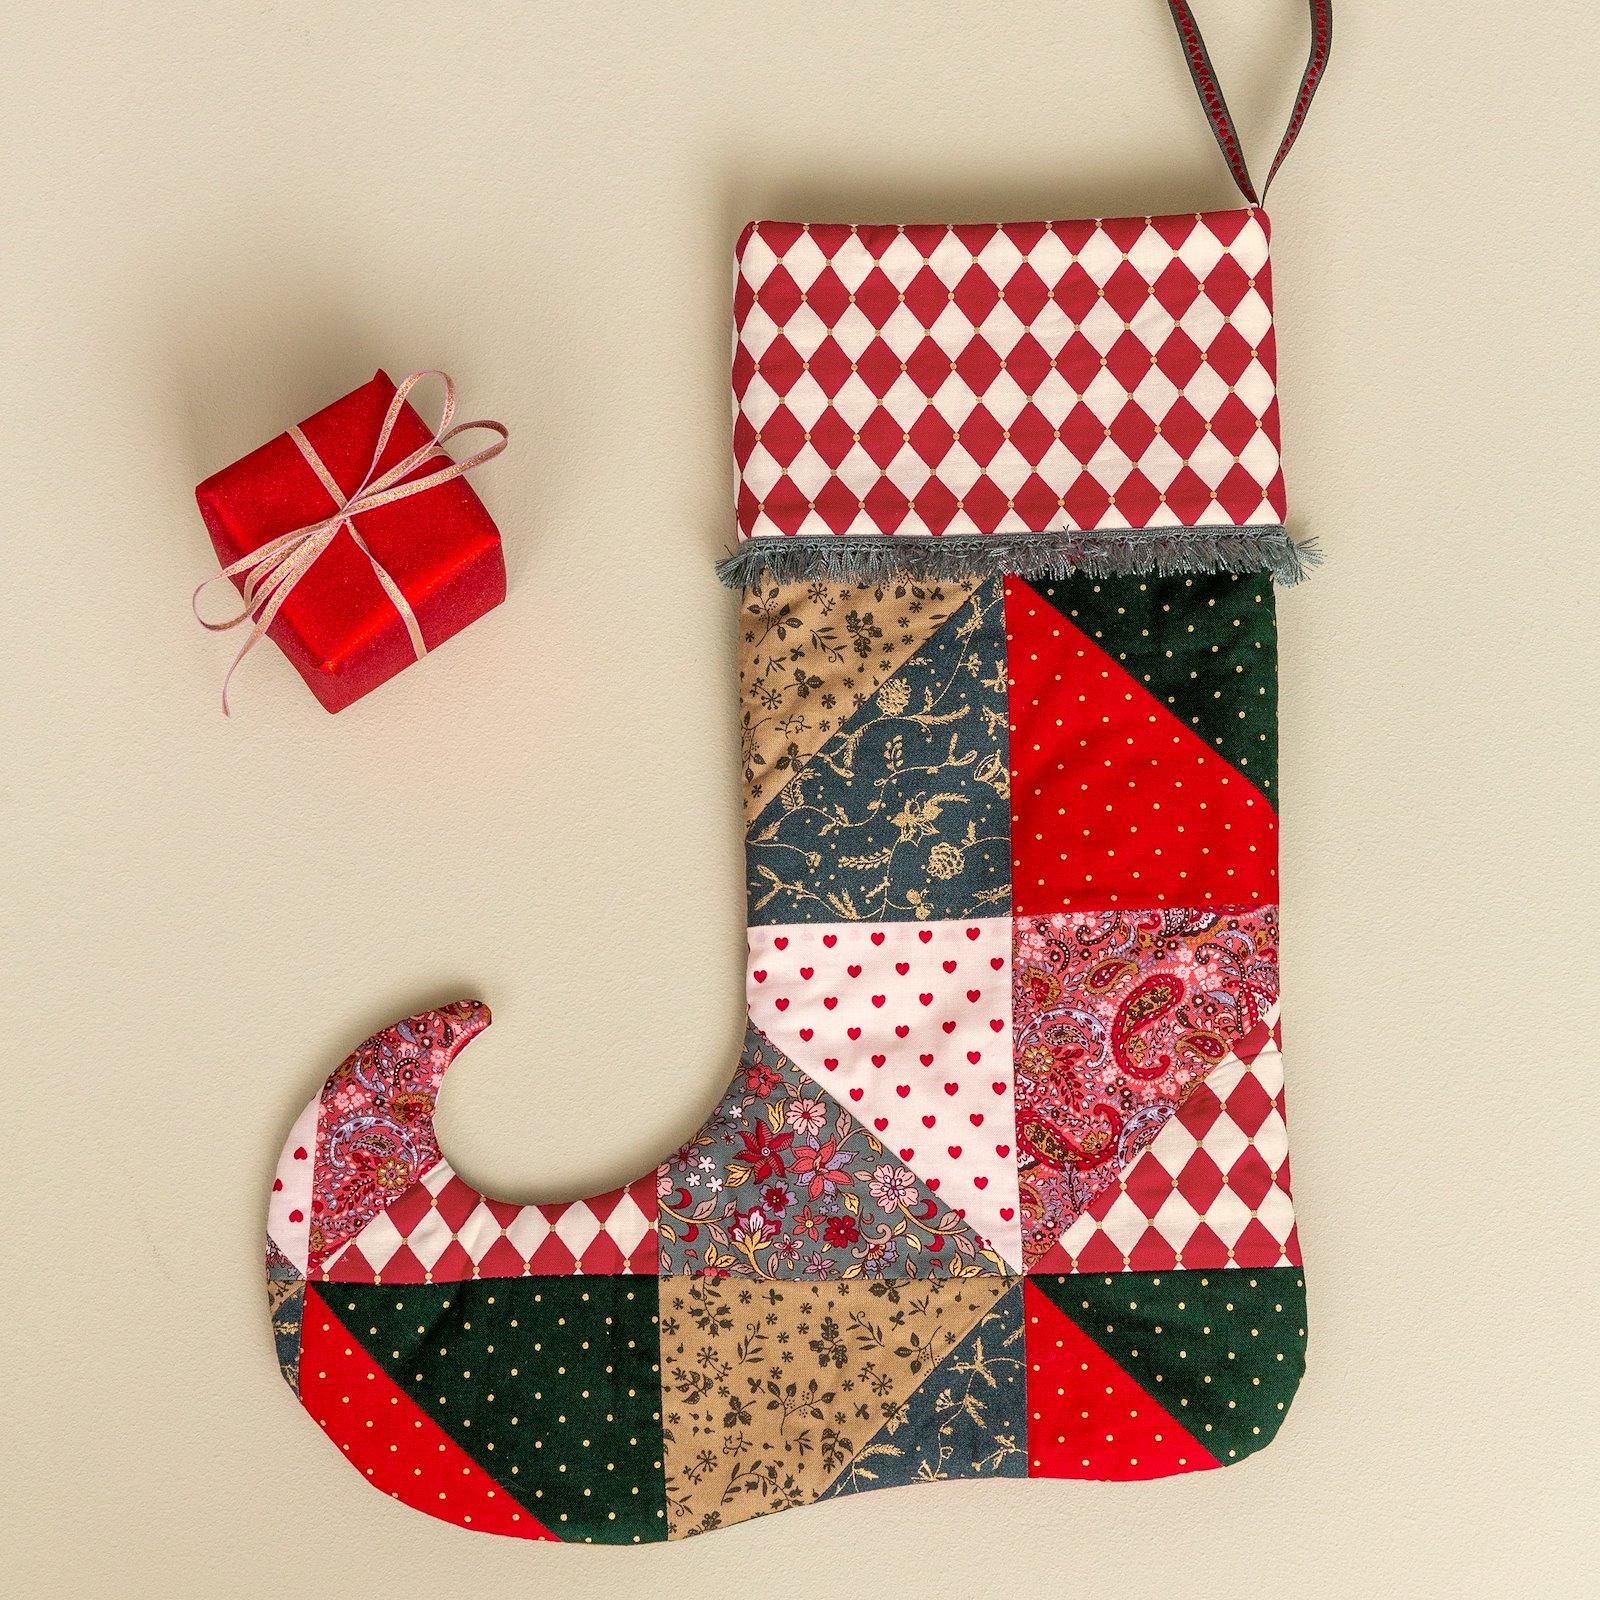 Christmas sock and heart p90311_DIY9014_852404_852401_852400_852326_852351_852339_790140_22255_22237_sskit